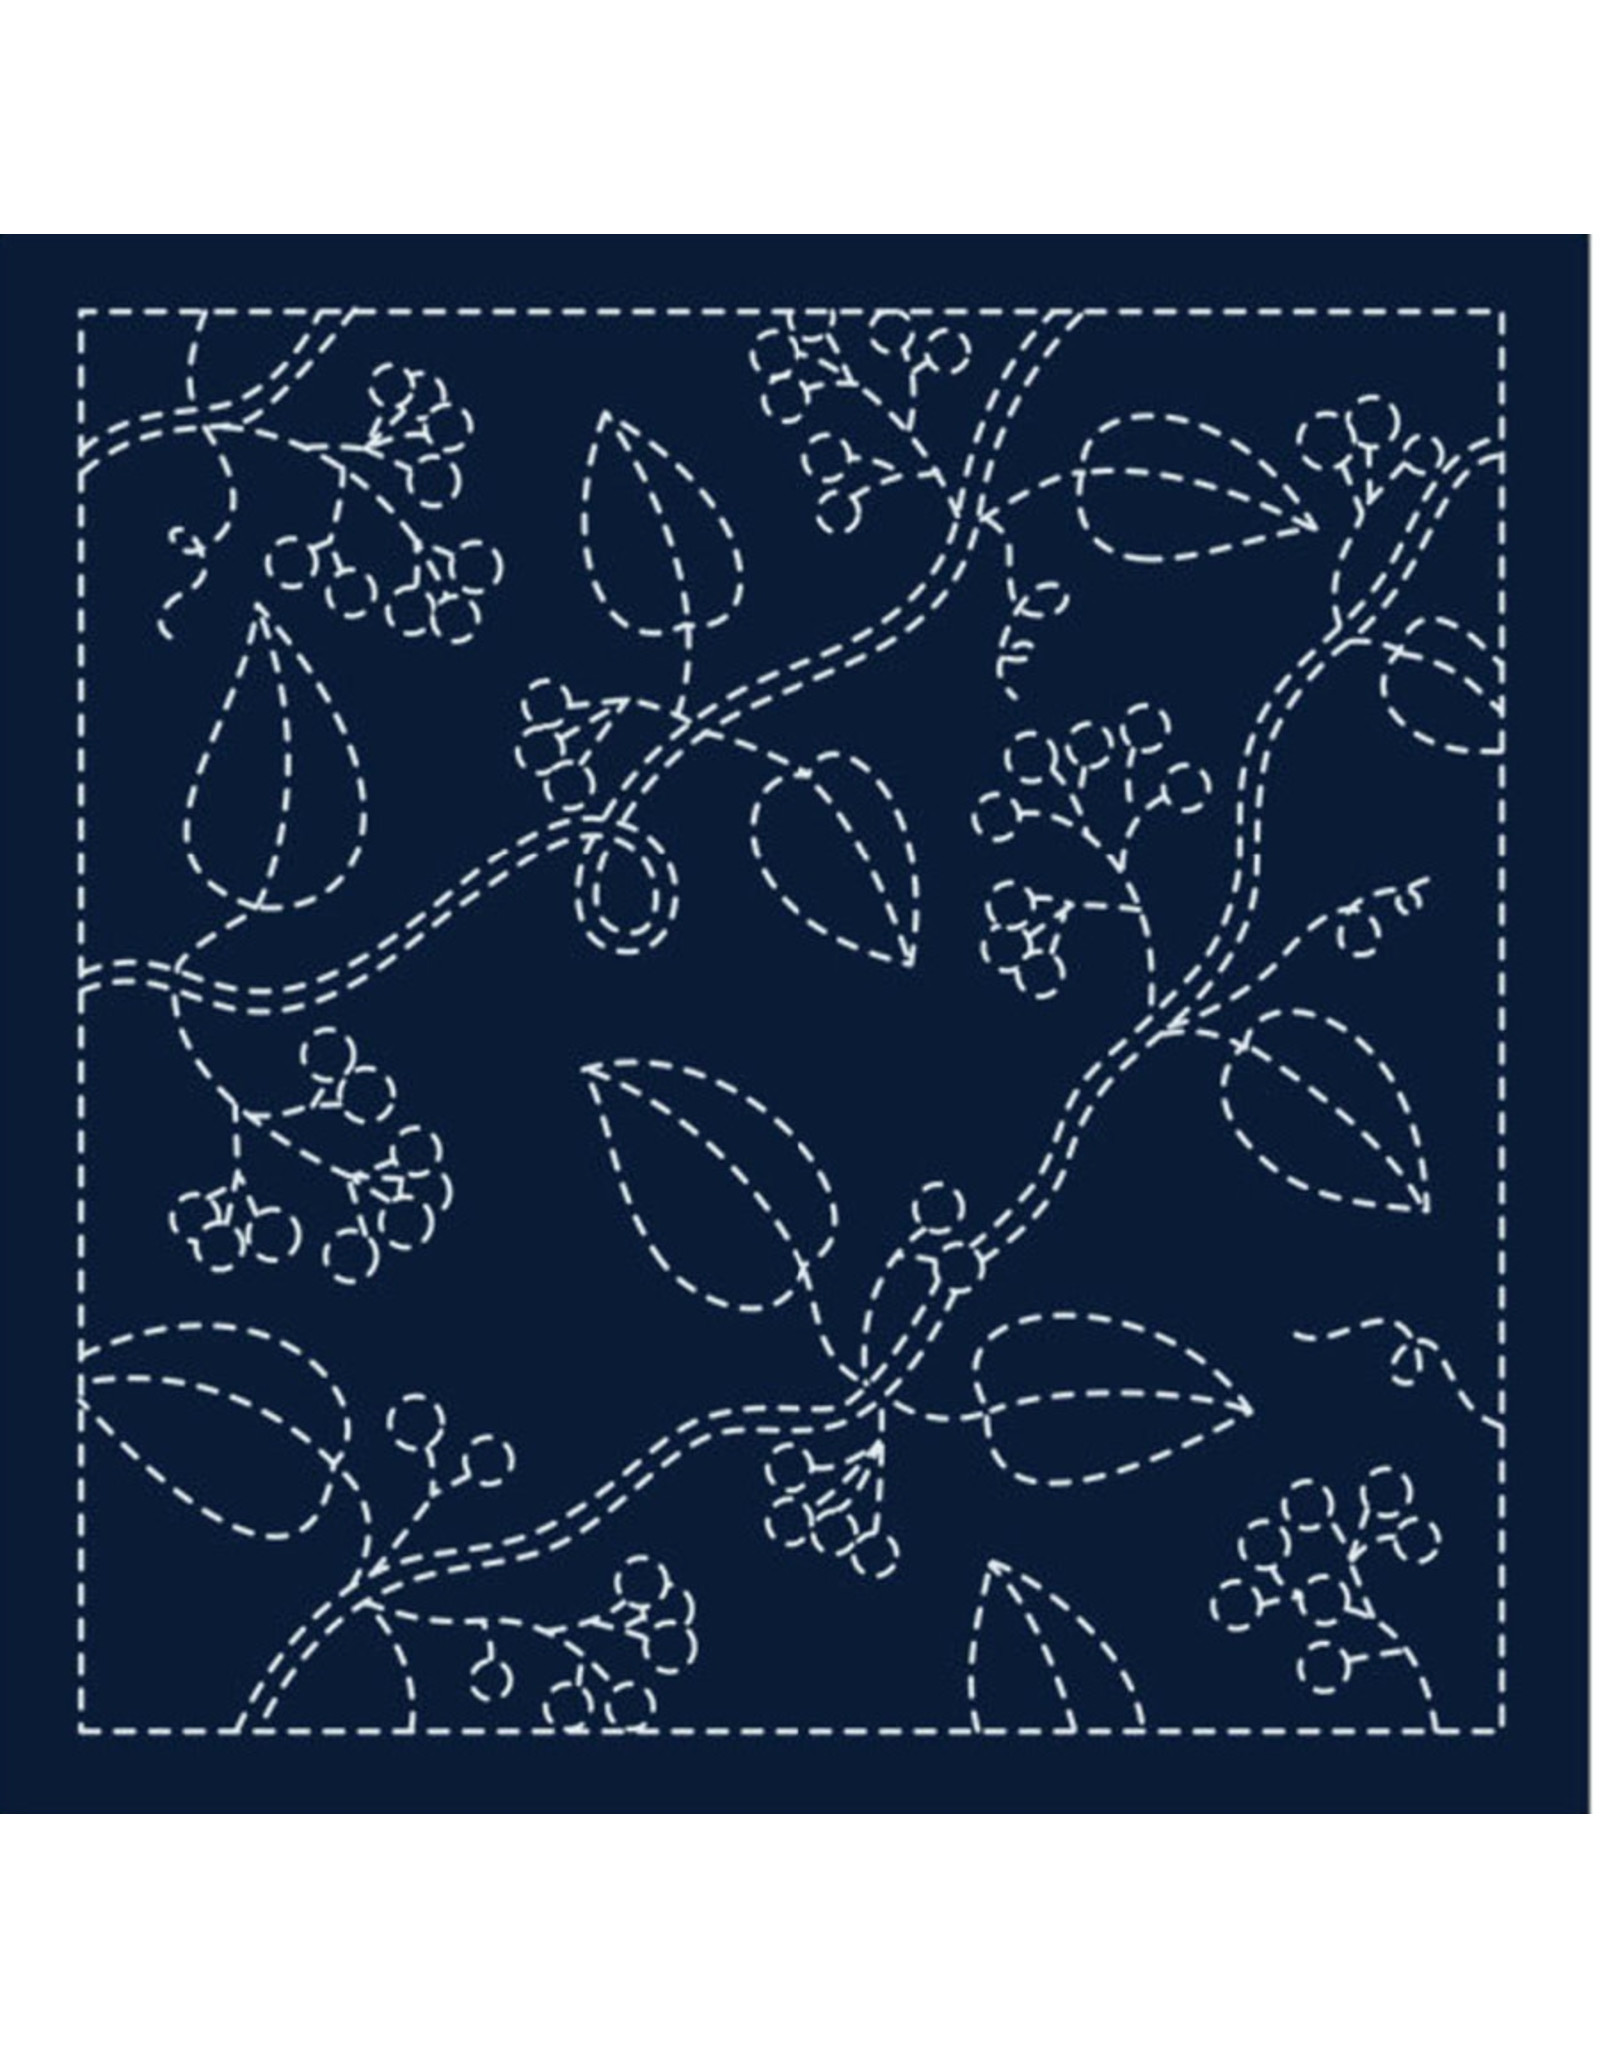 Japan Import Sashiko Cloth, Hana-Fukin (Nuts) in Navy H-213